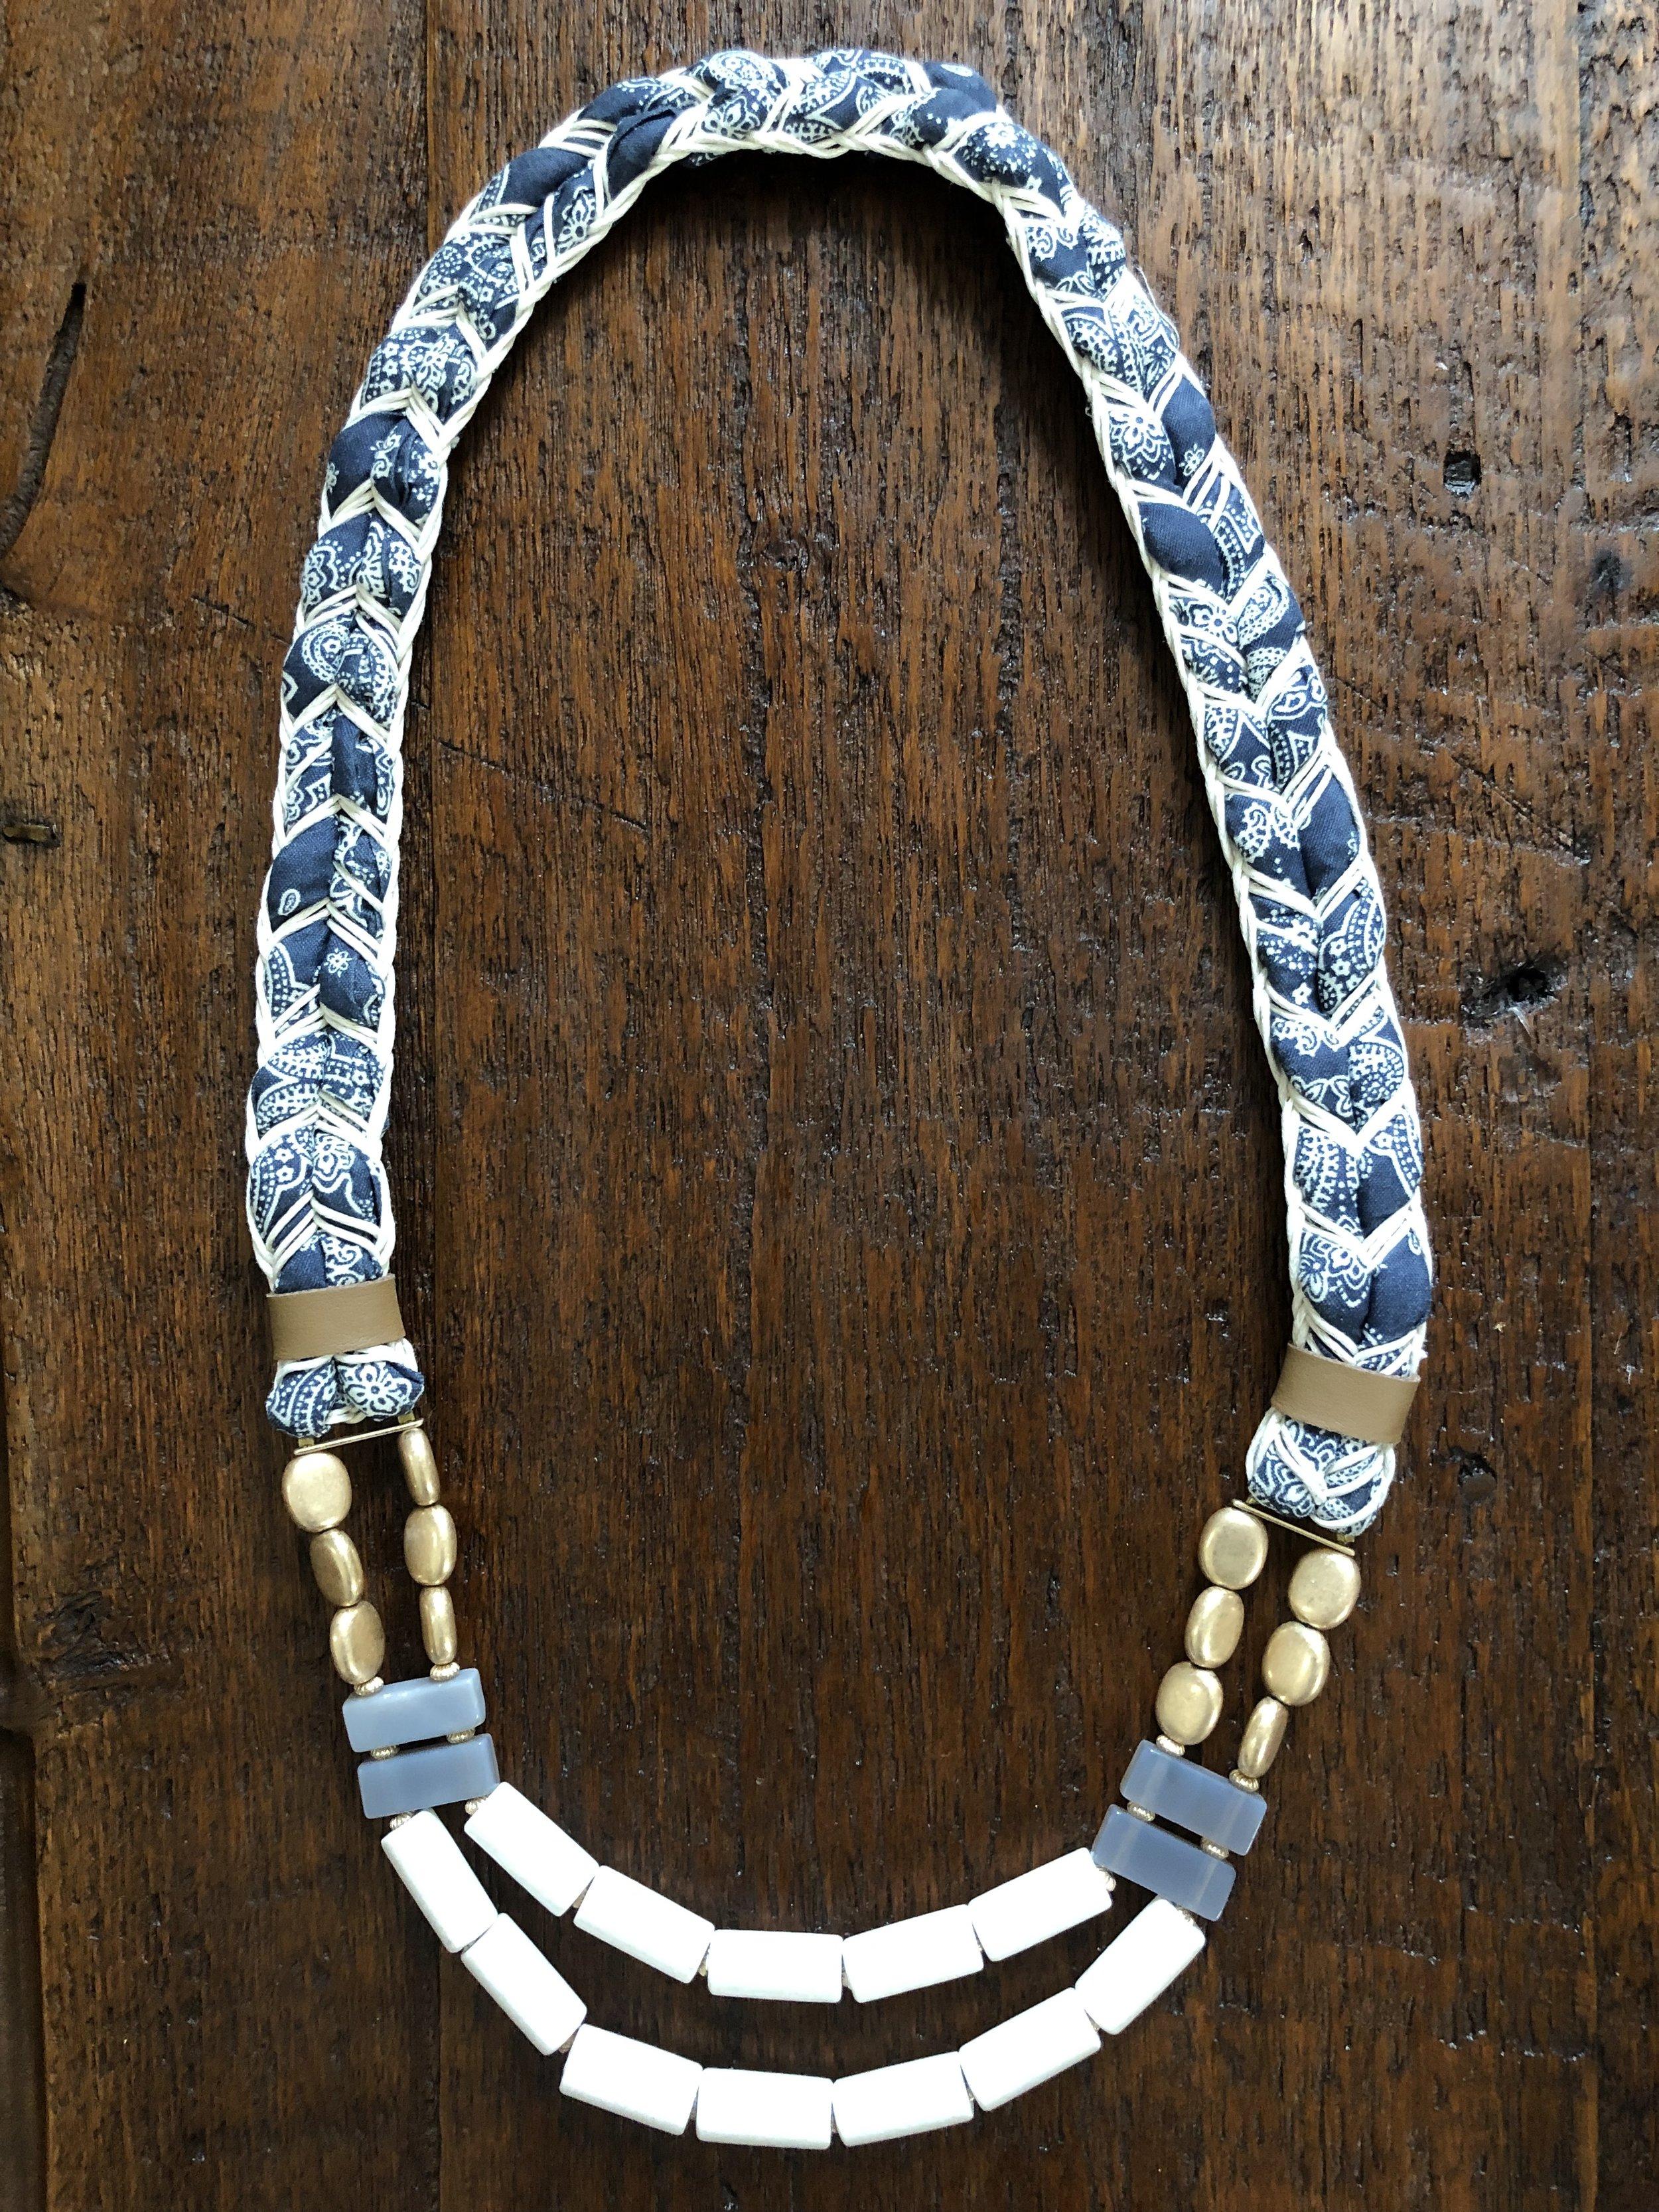 Bandana & Bead Necklace - $27.99